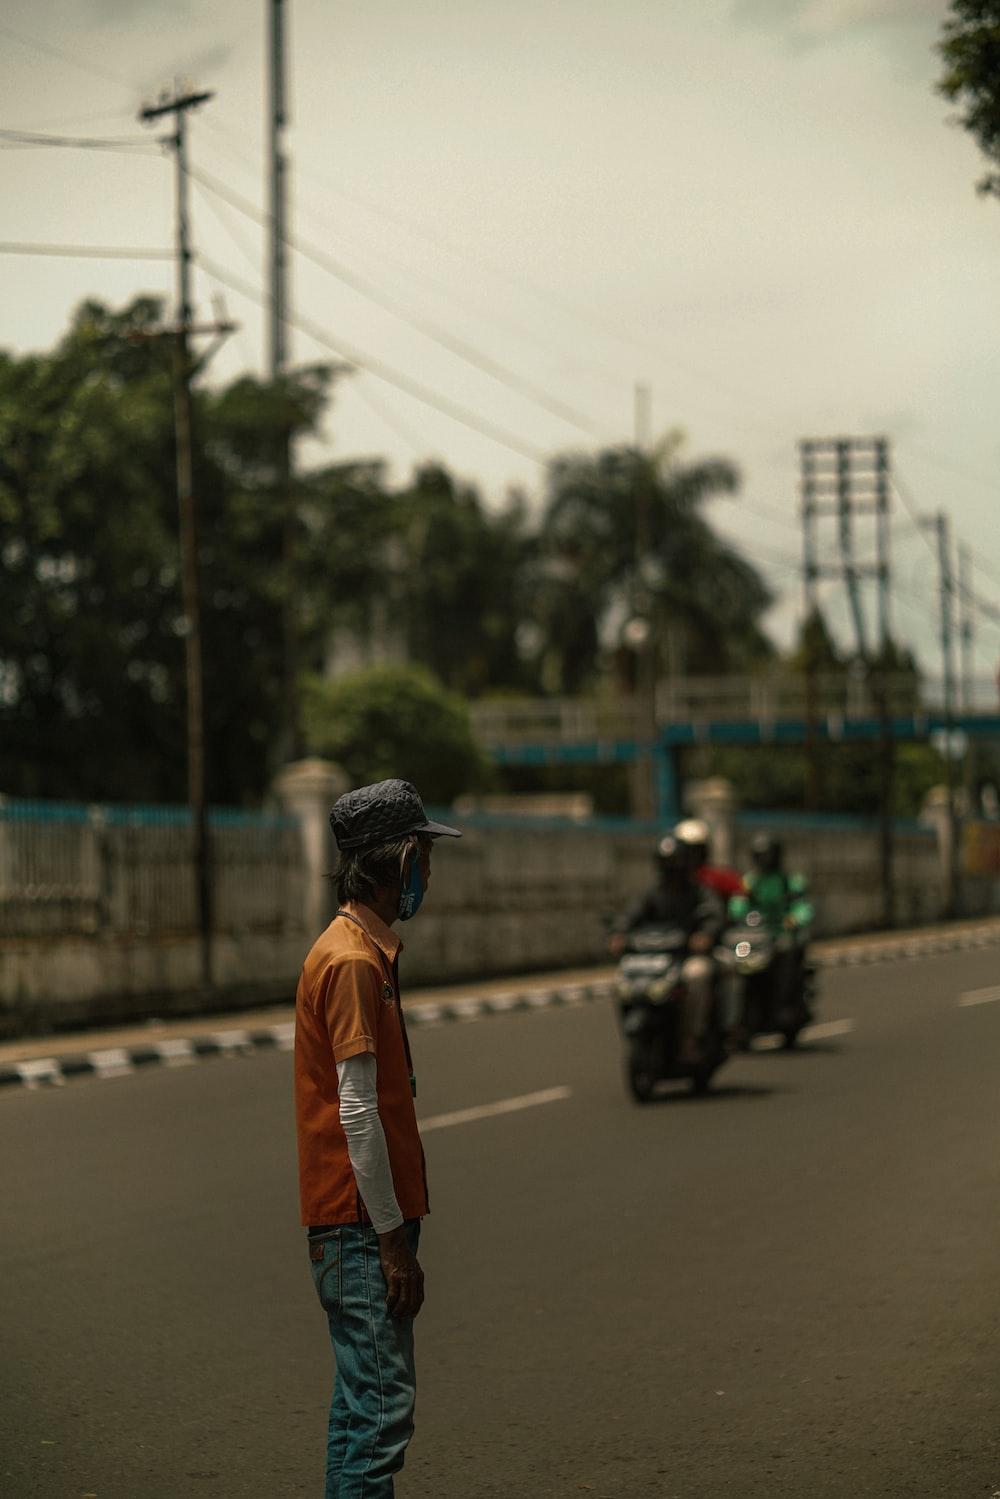 man in orange jacket and black helmet standing on road during daytime